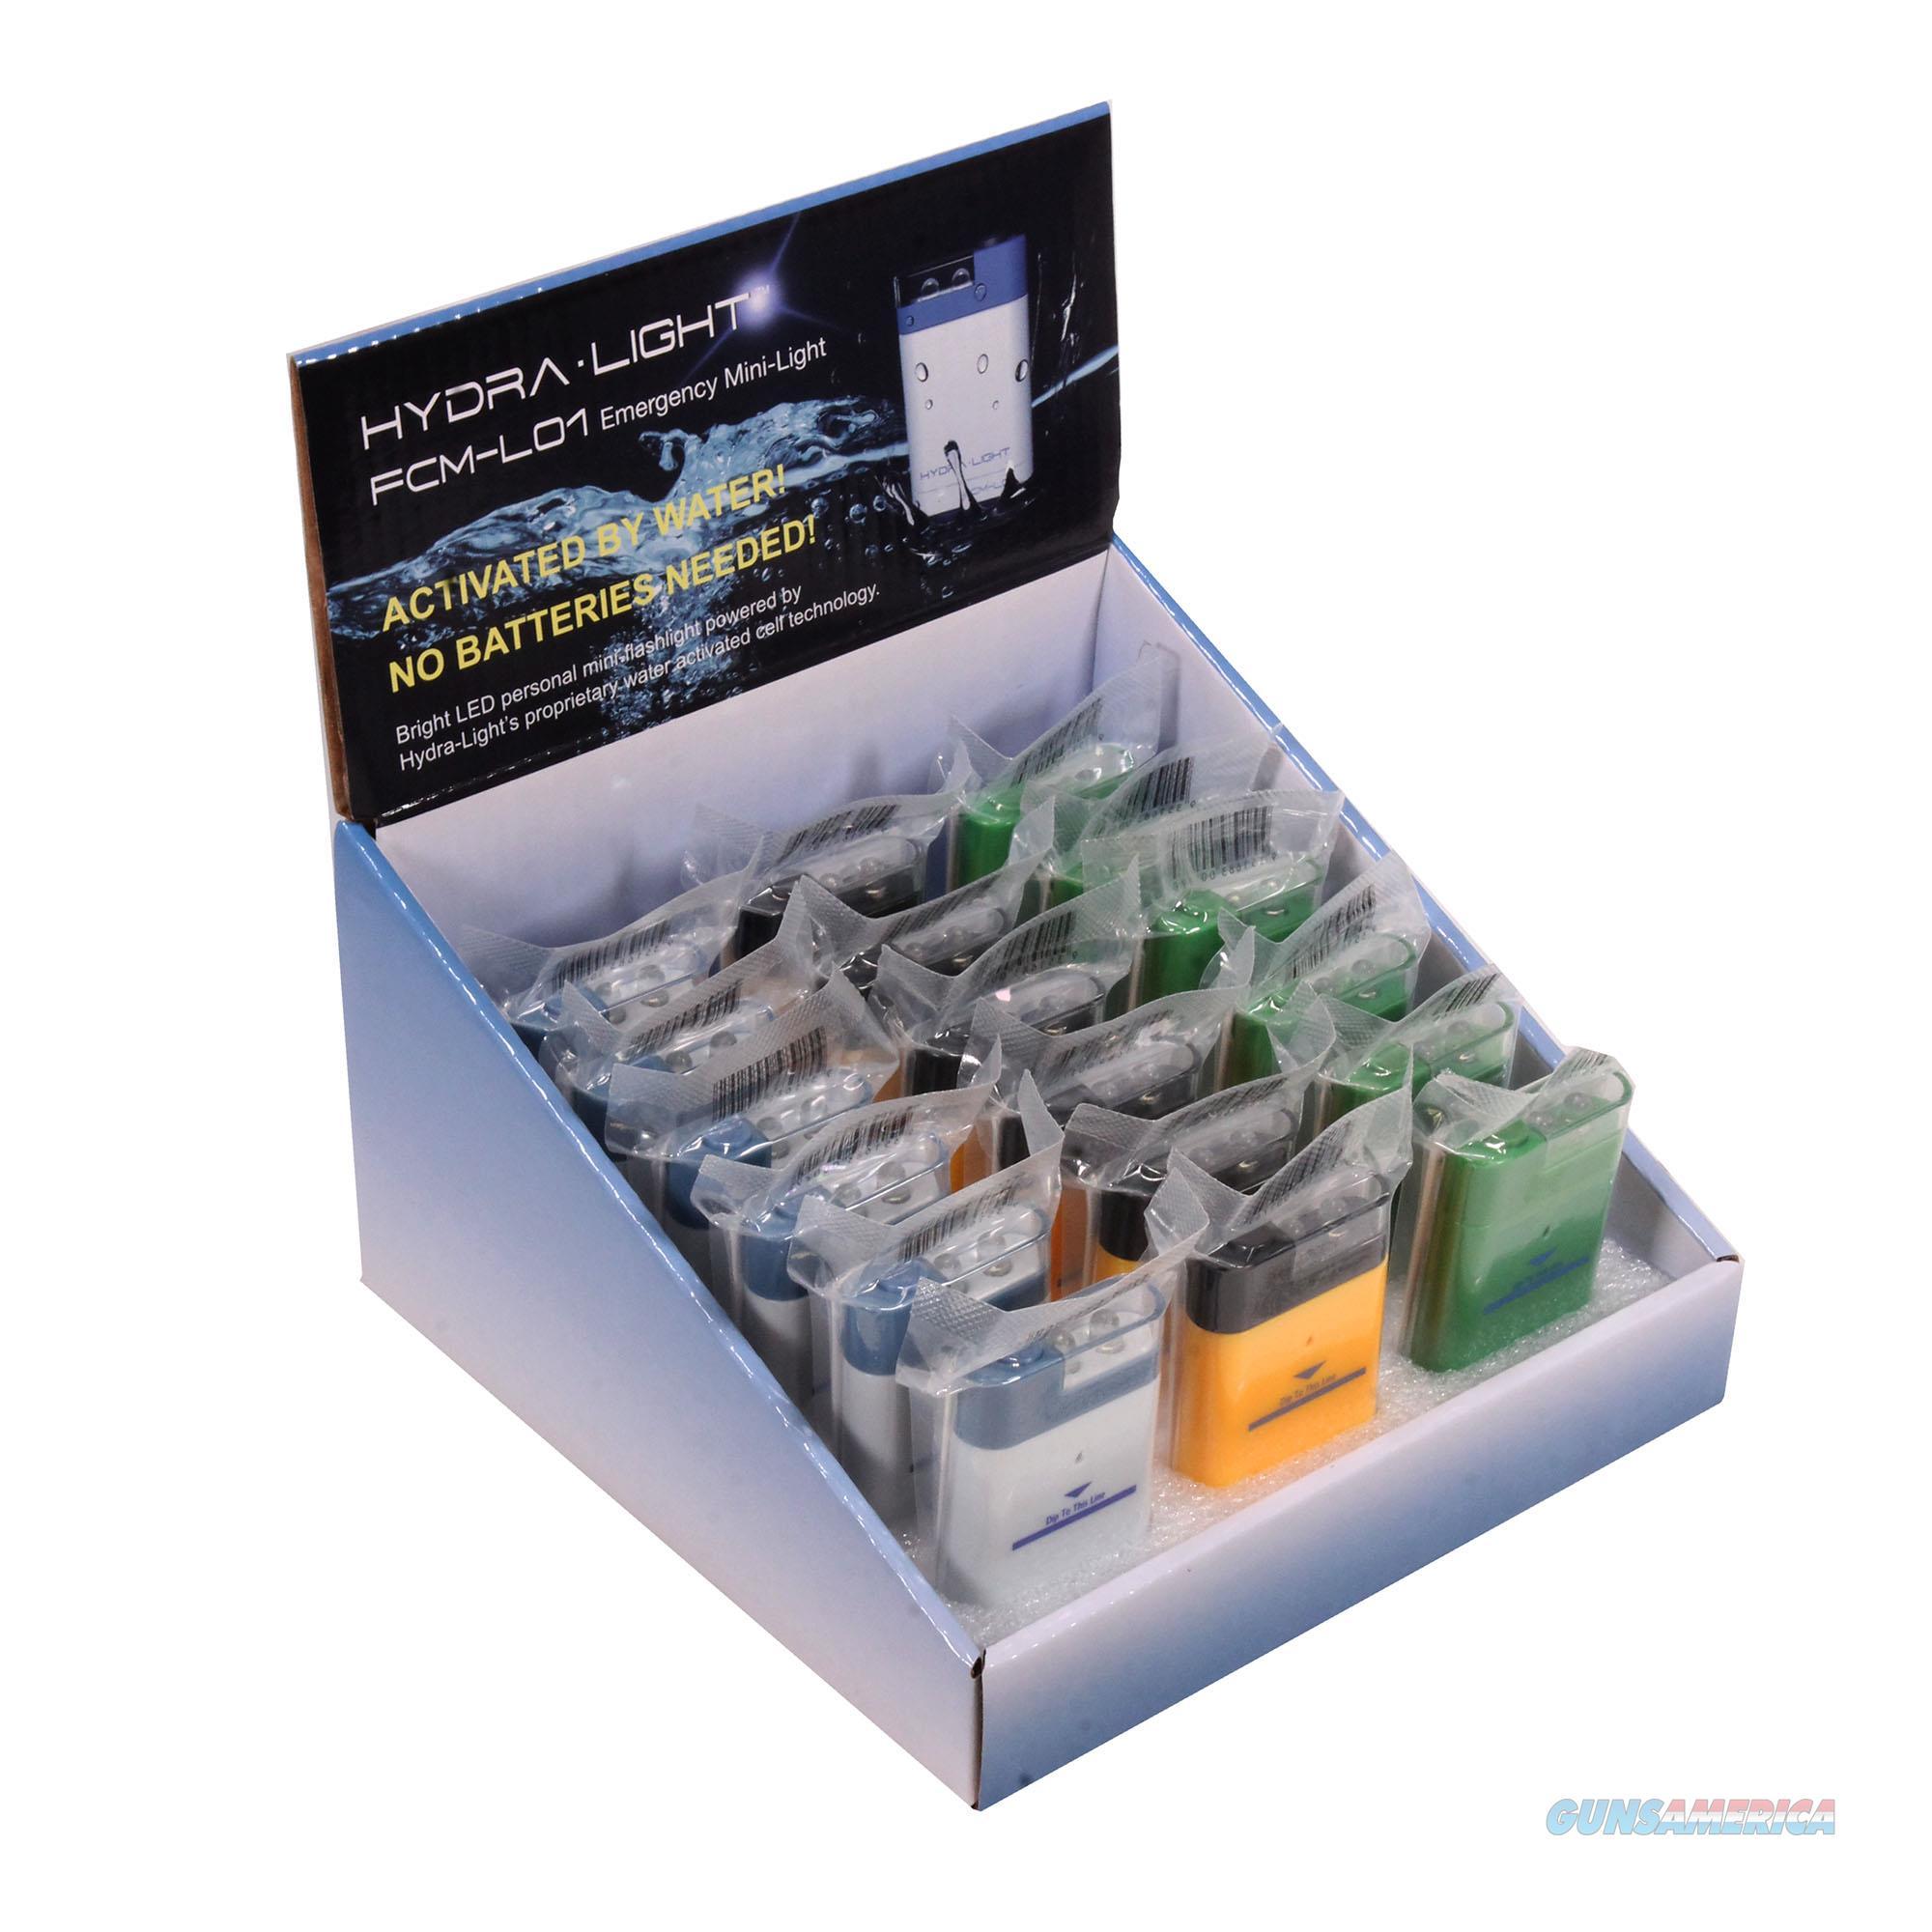 Hydra Light Mini Disposable Emergency Mini Light (Blue, Green, Yellow) FCM-L01  Non-Guns > Miscellaneous